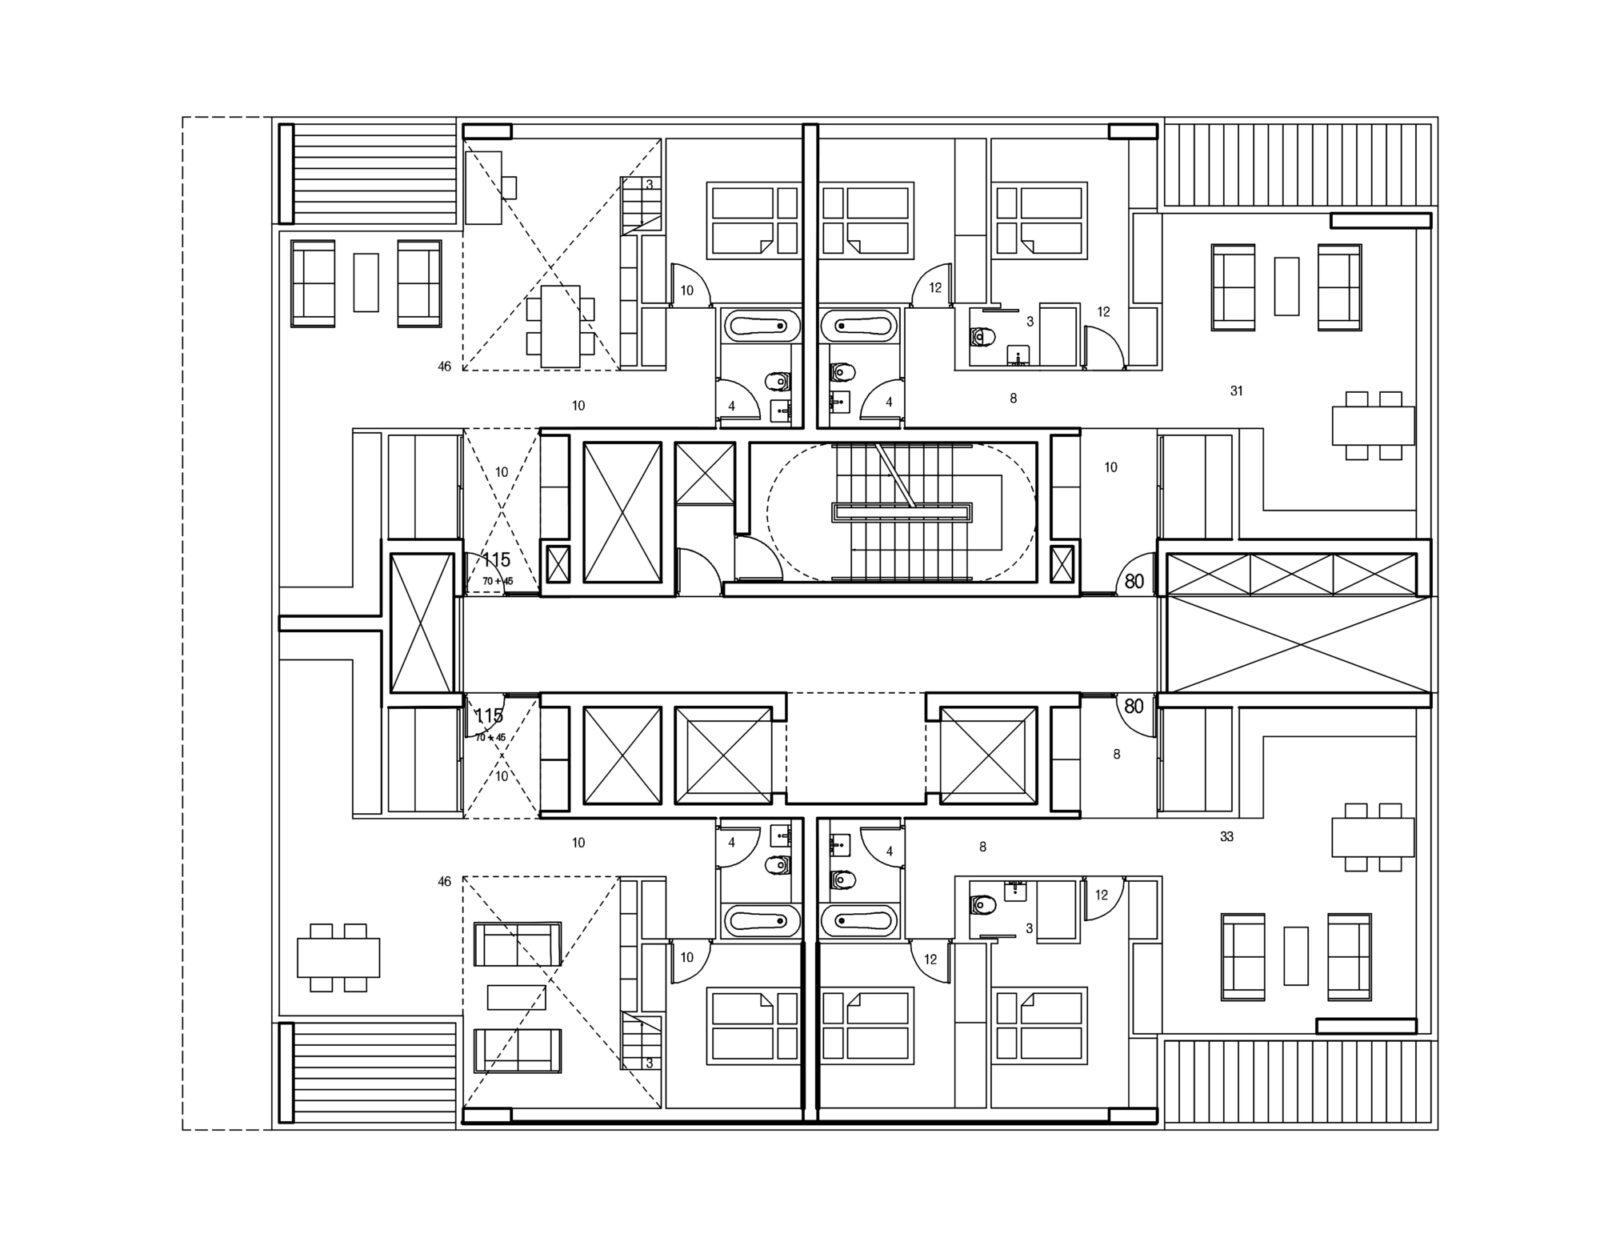 Res Tower Lower Floor Plan